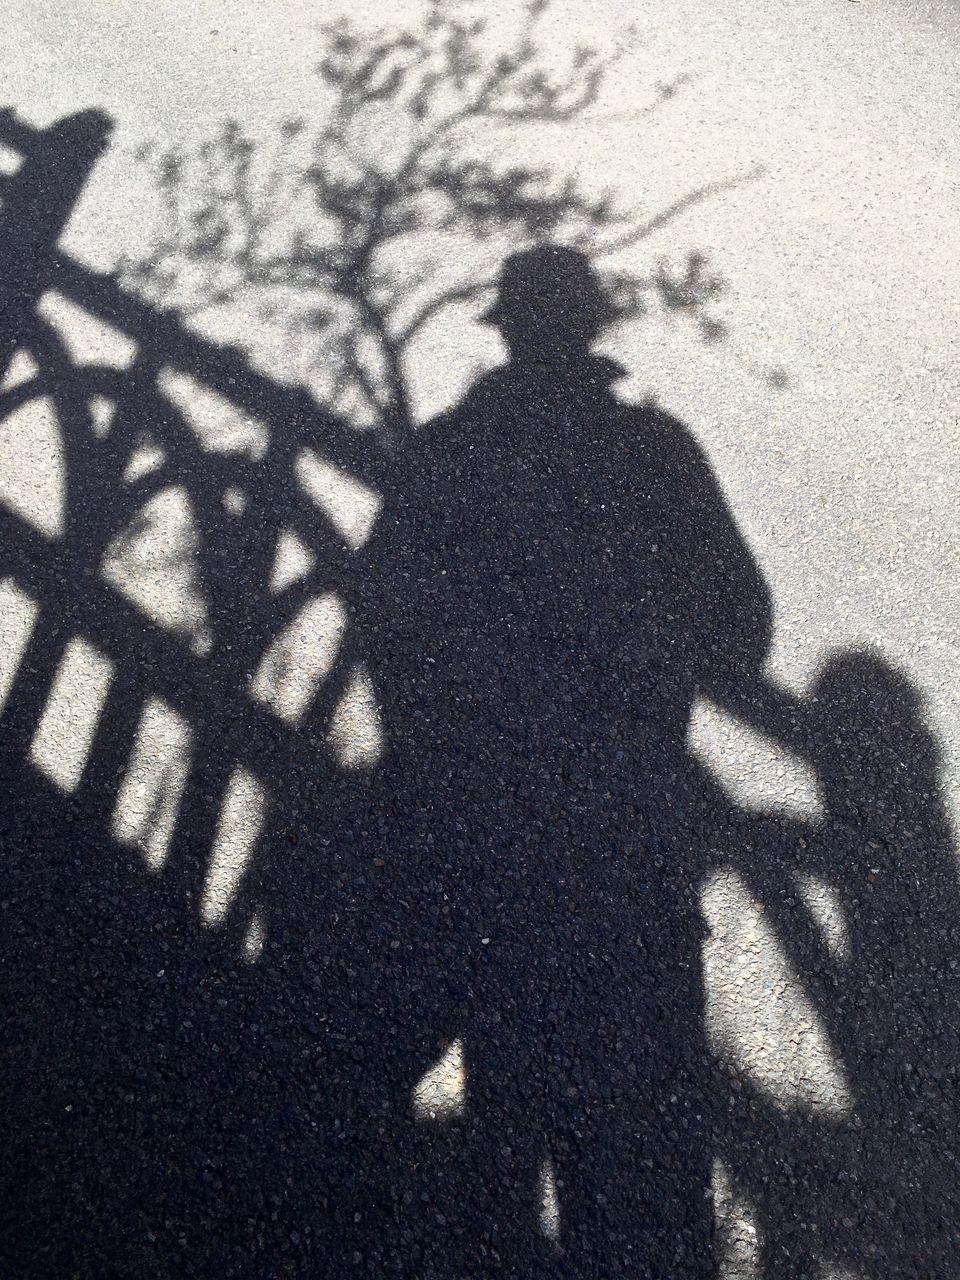 Shadow on road